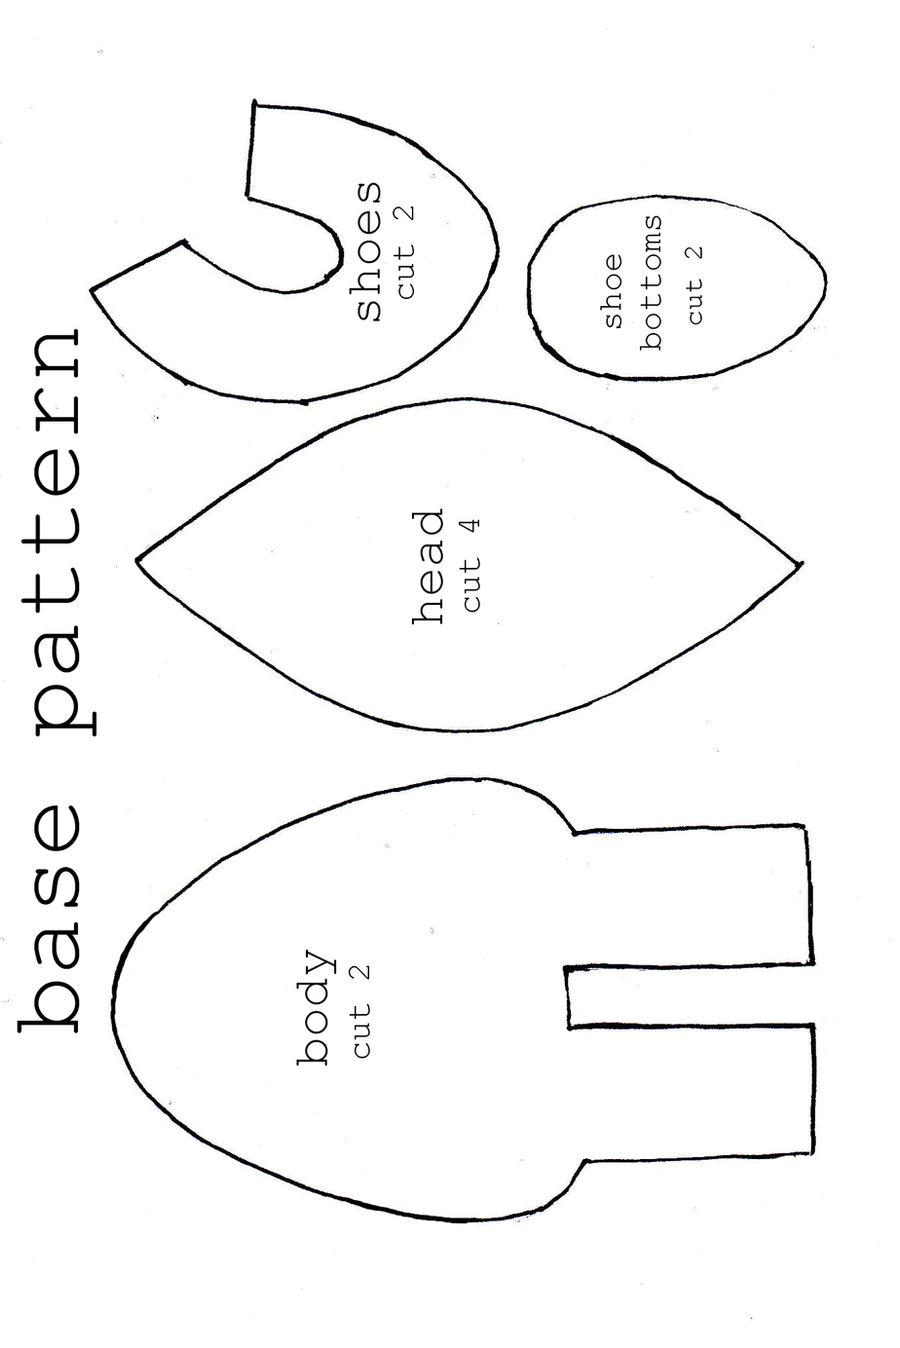 homestuck sewing pattern by b00ts